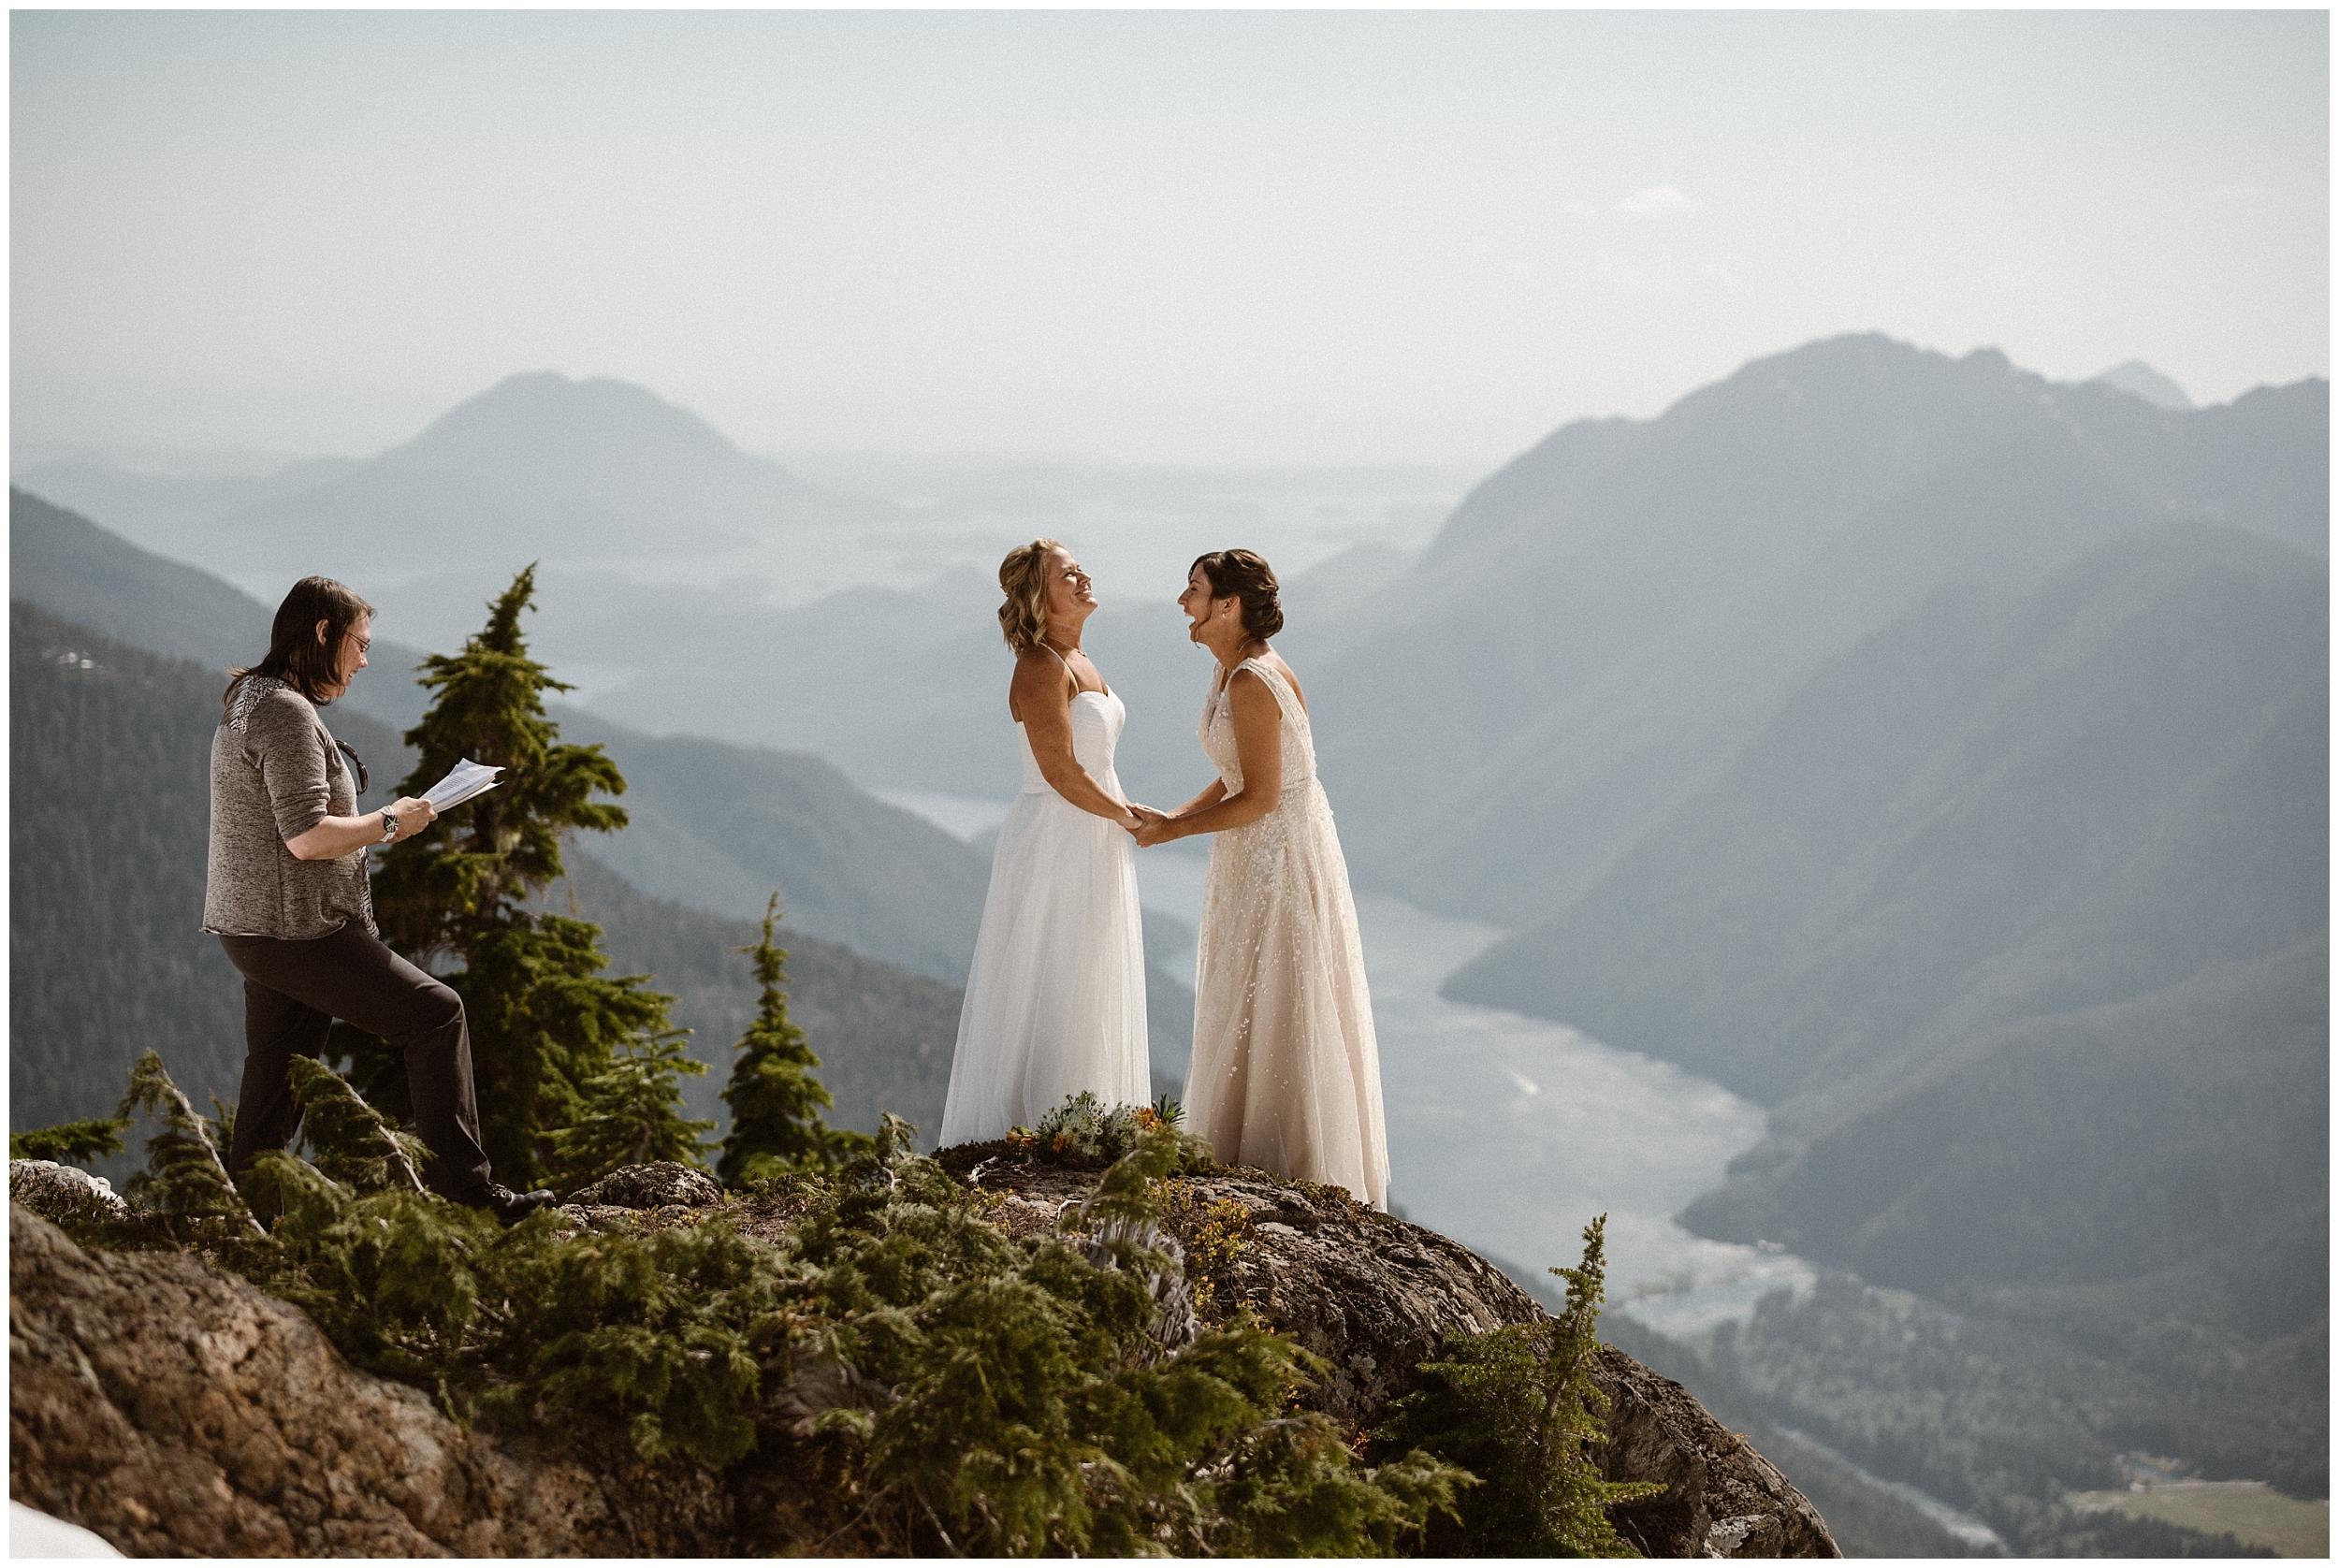 elopement ceremony ideas what